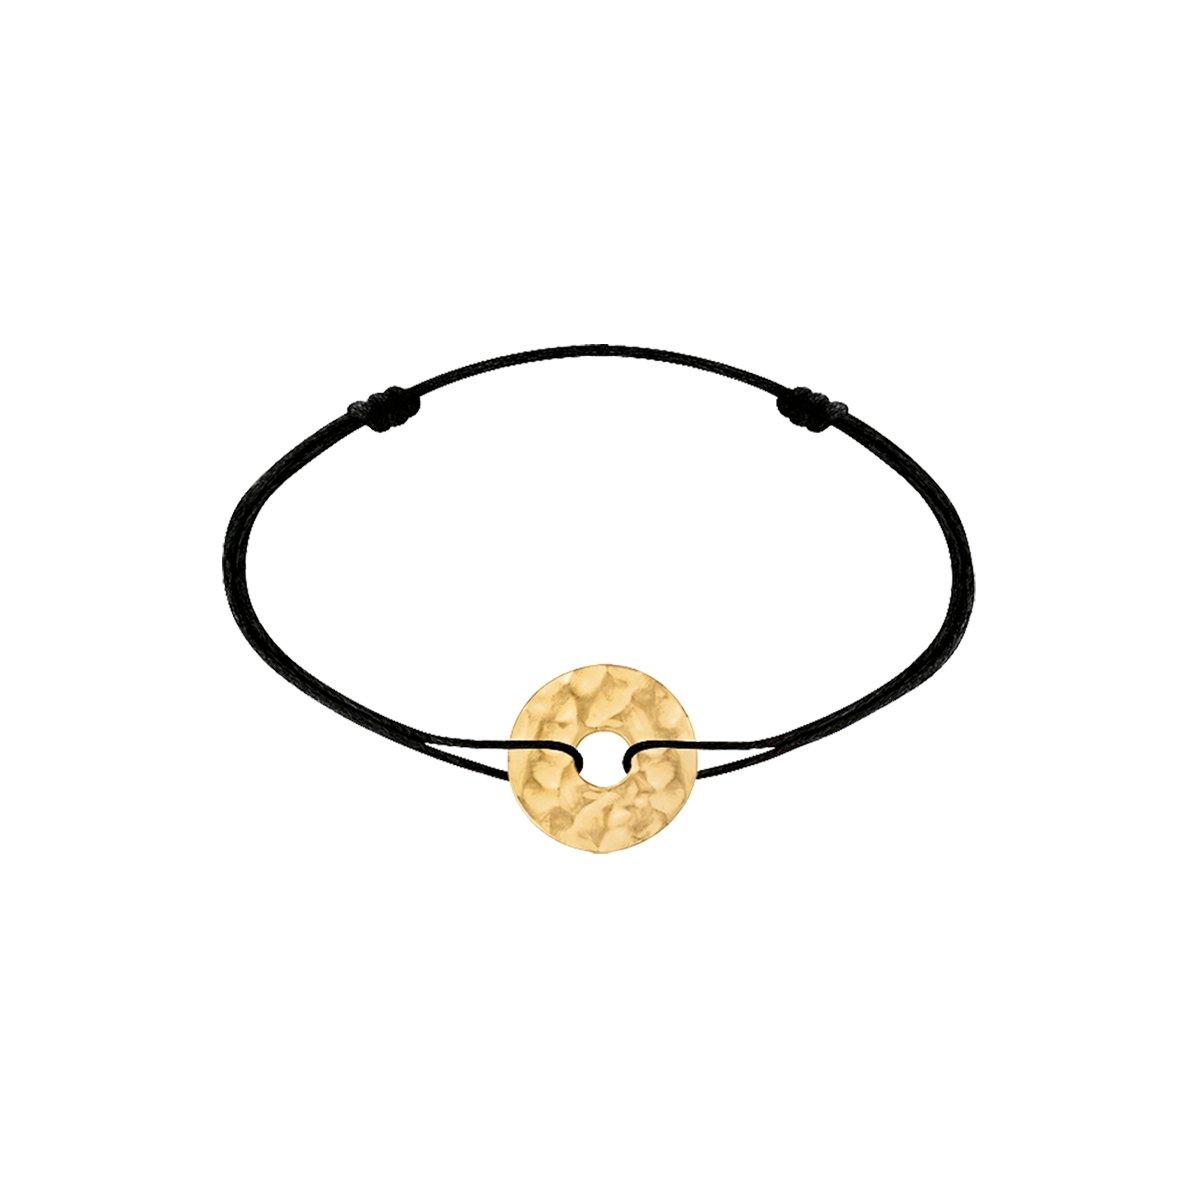 Bracelet sur cordon dinh van Pi en or jaune vue 1